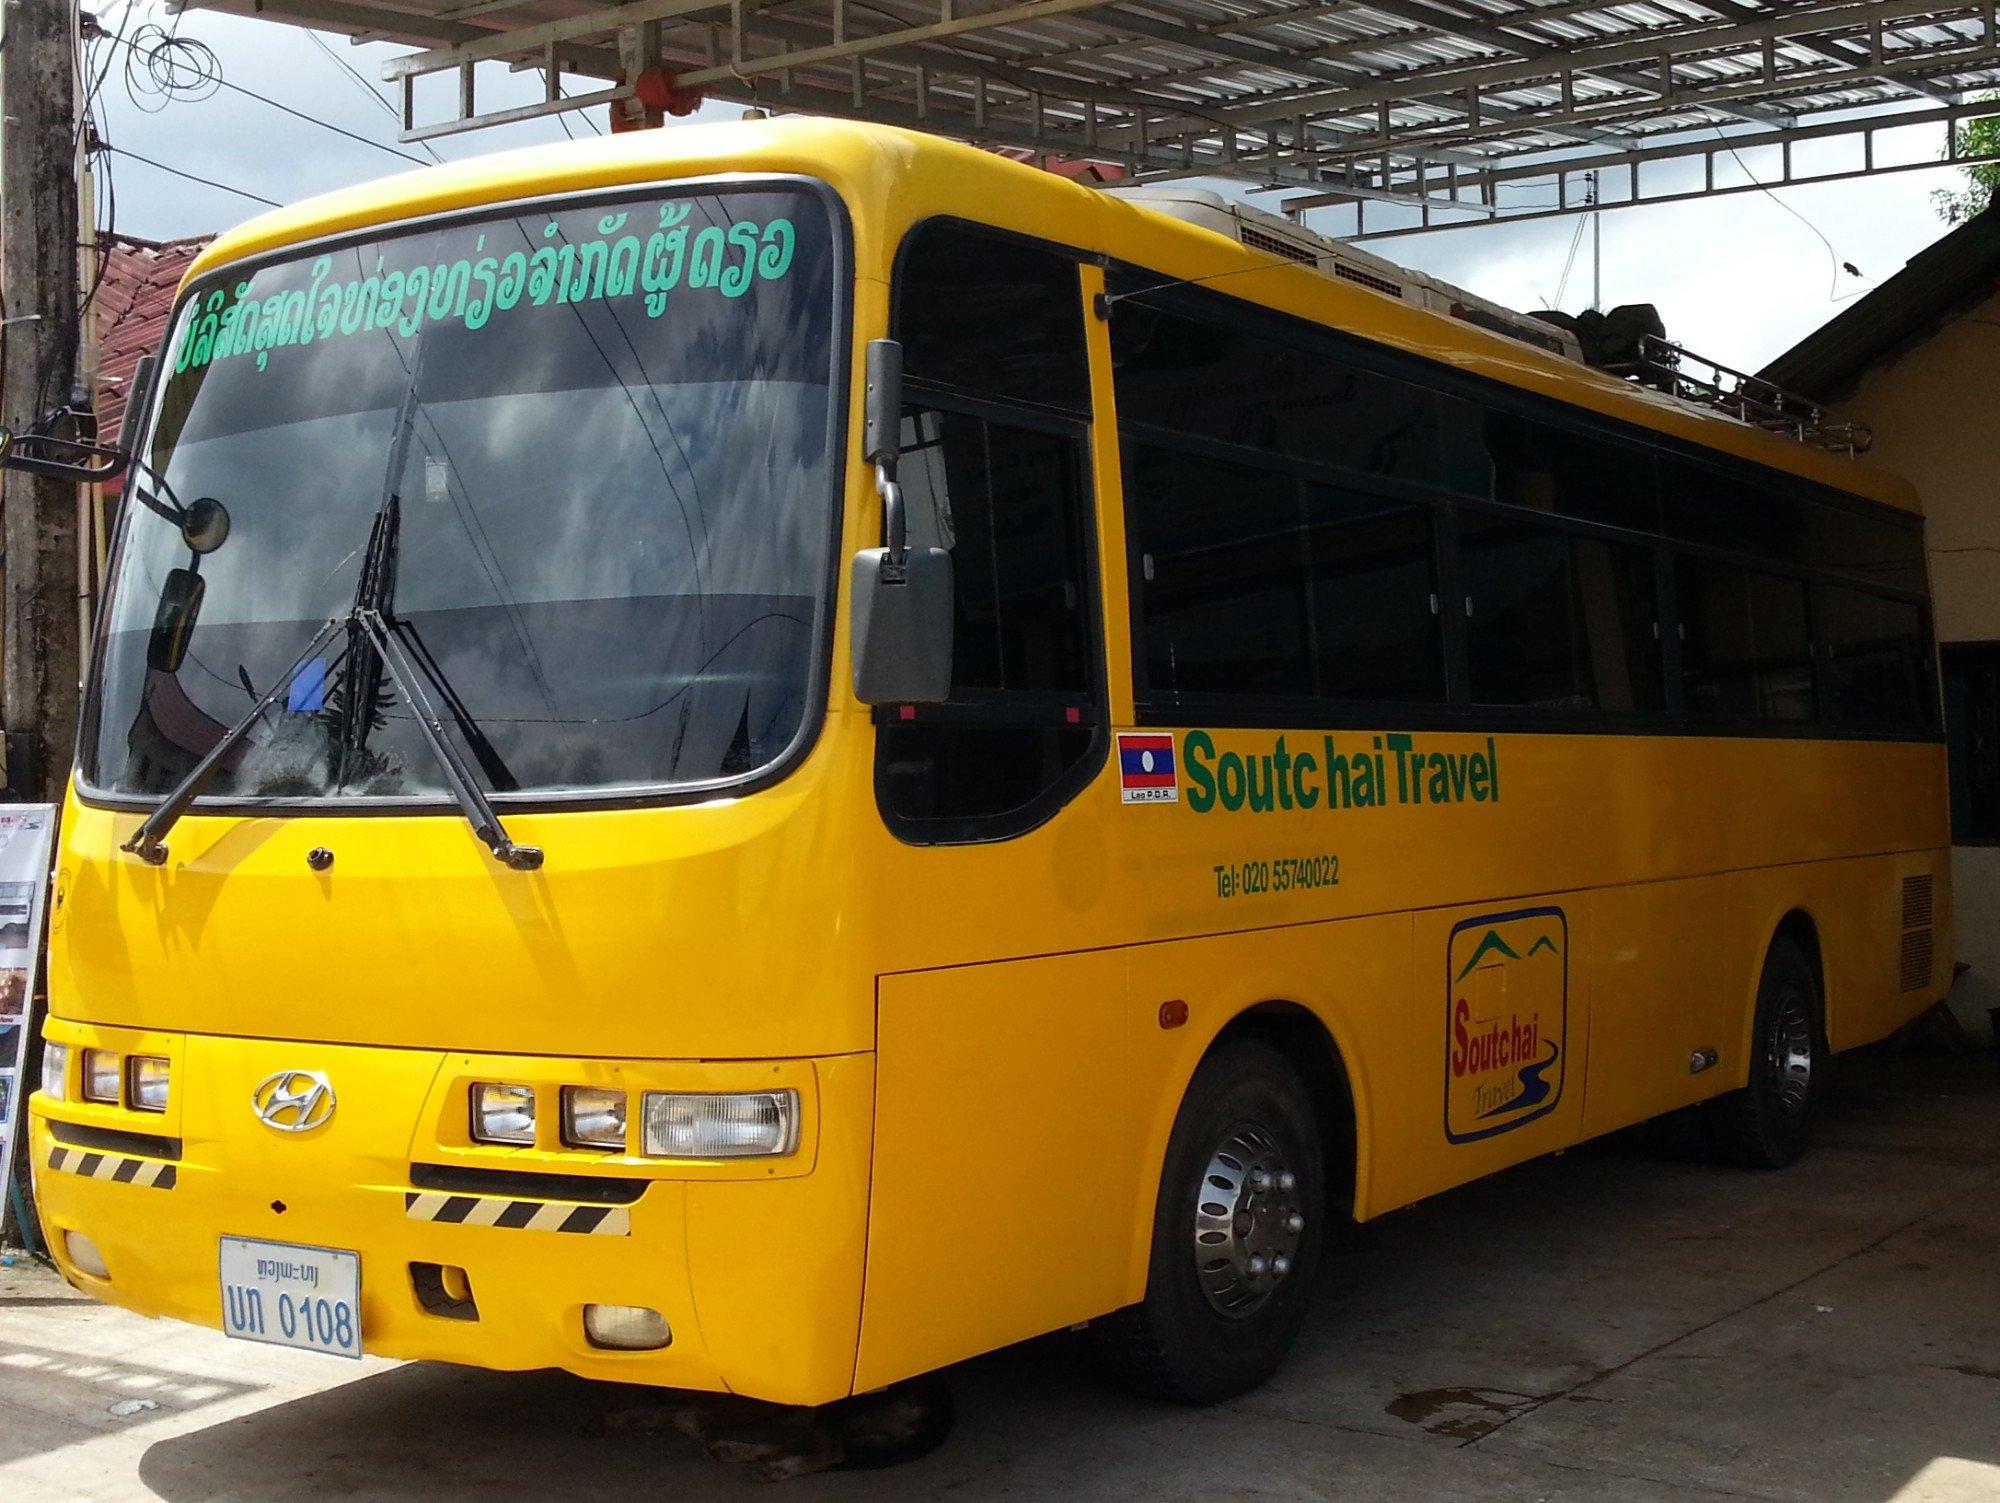 Soutchai Travel Bus